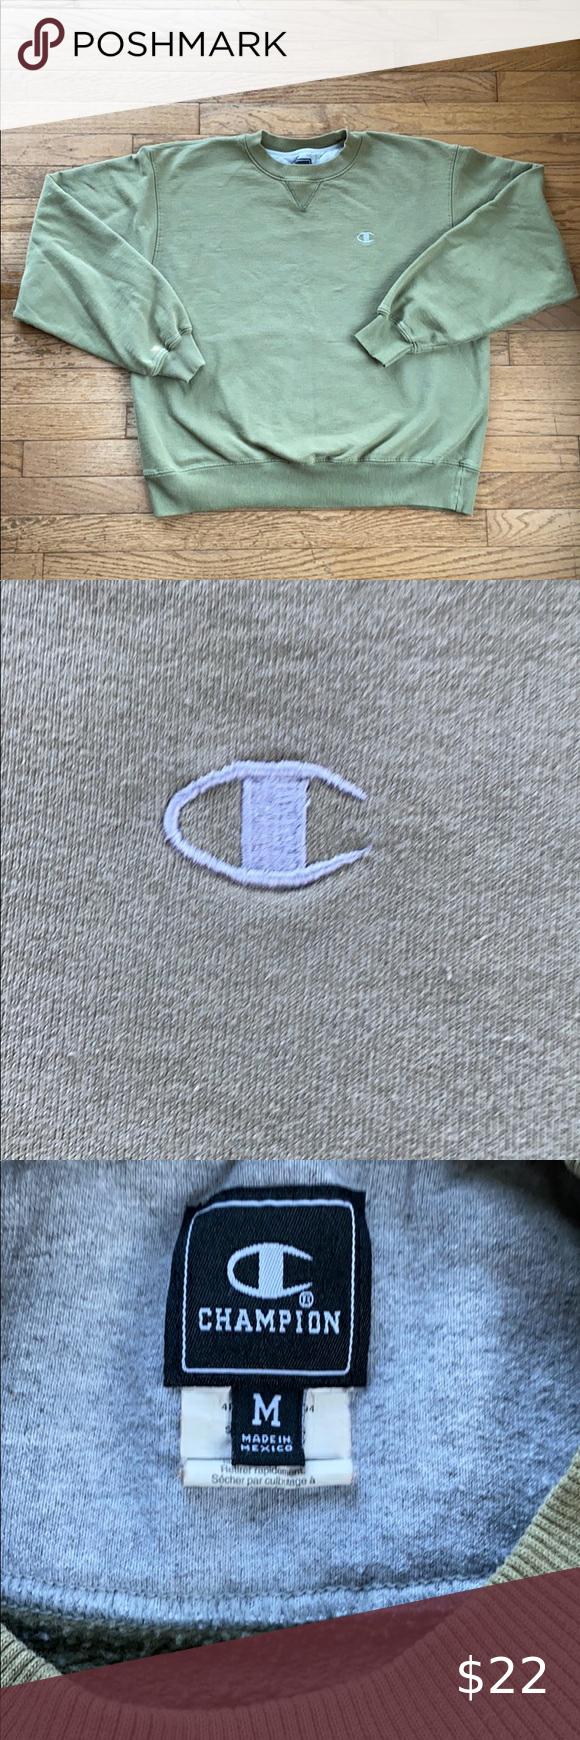 Champion Crewneck Sweatshirt Size Medium Champion Crewneck Sweatshirt Crew Neck Sweatshirt Clothes Design [ 1740 x 580 Pixel ]